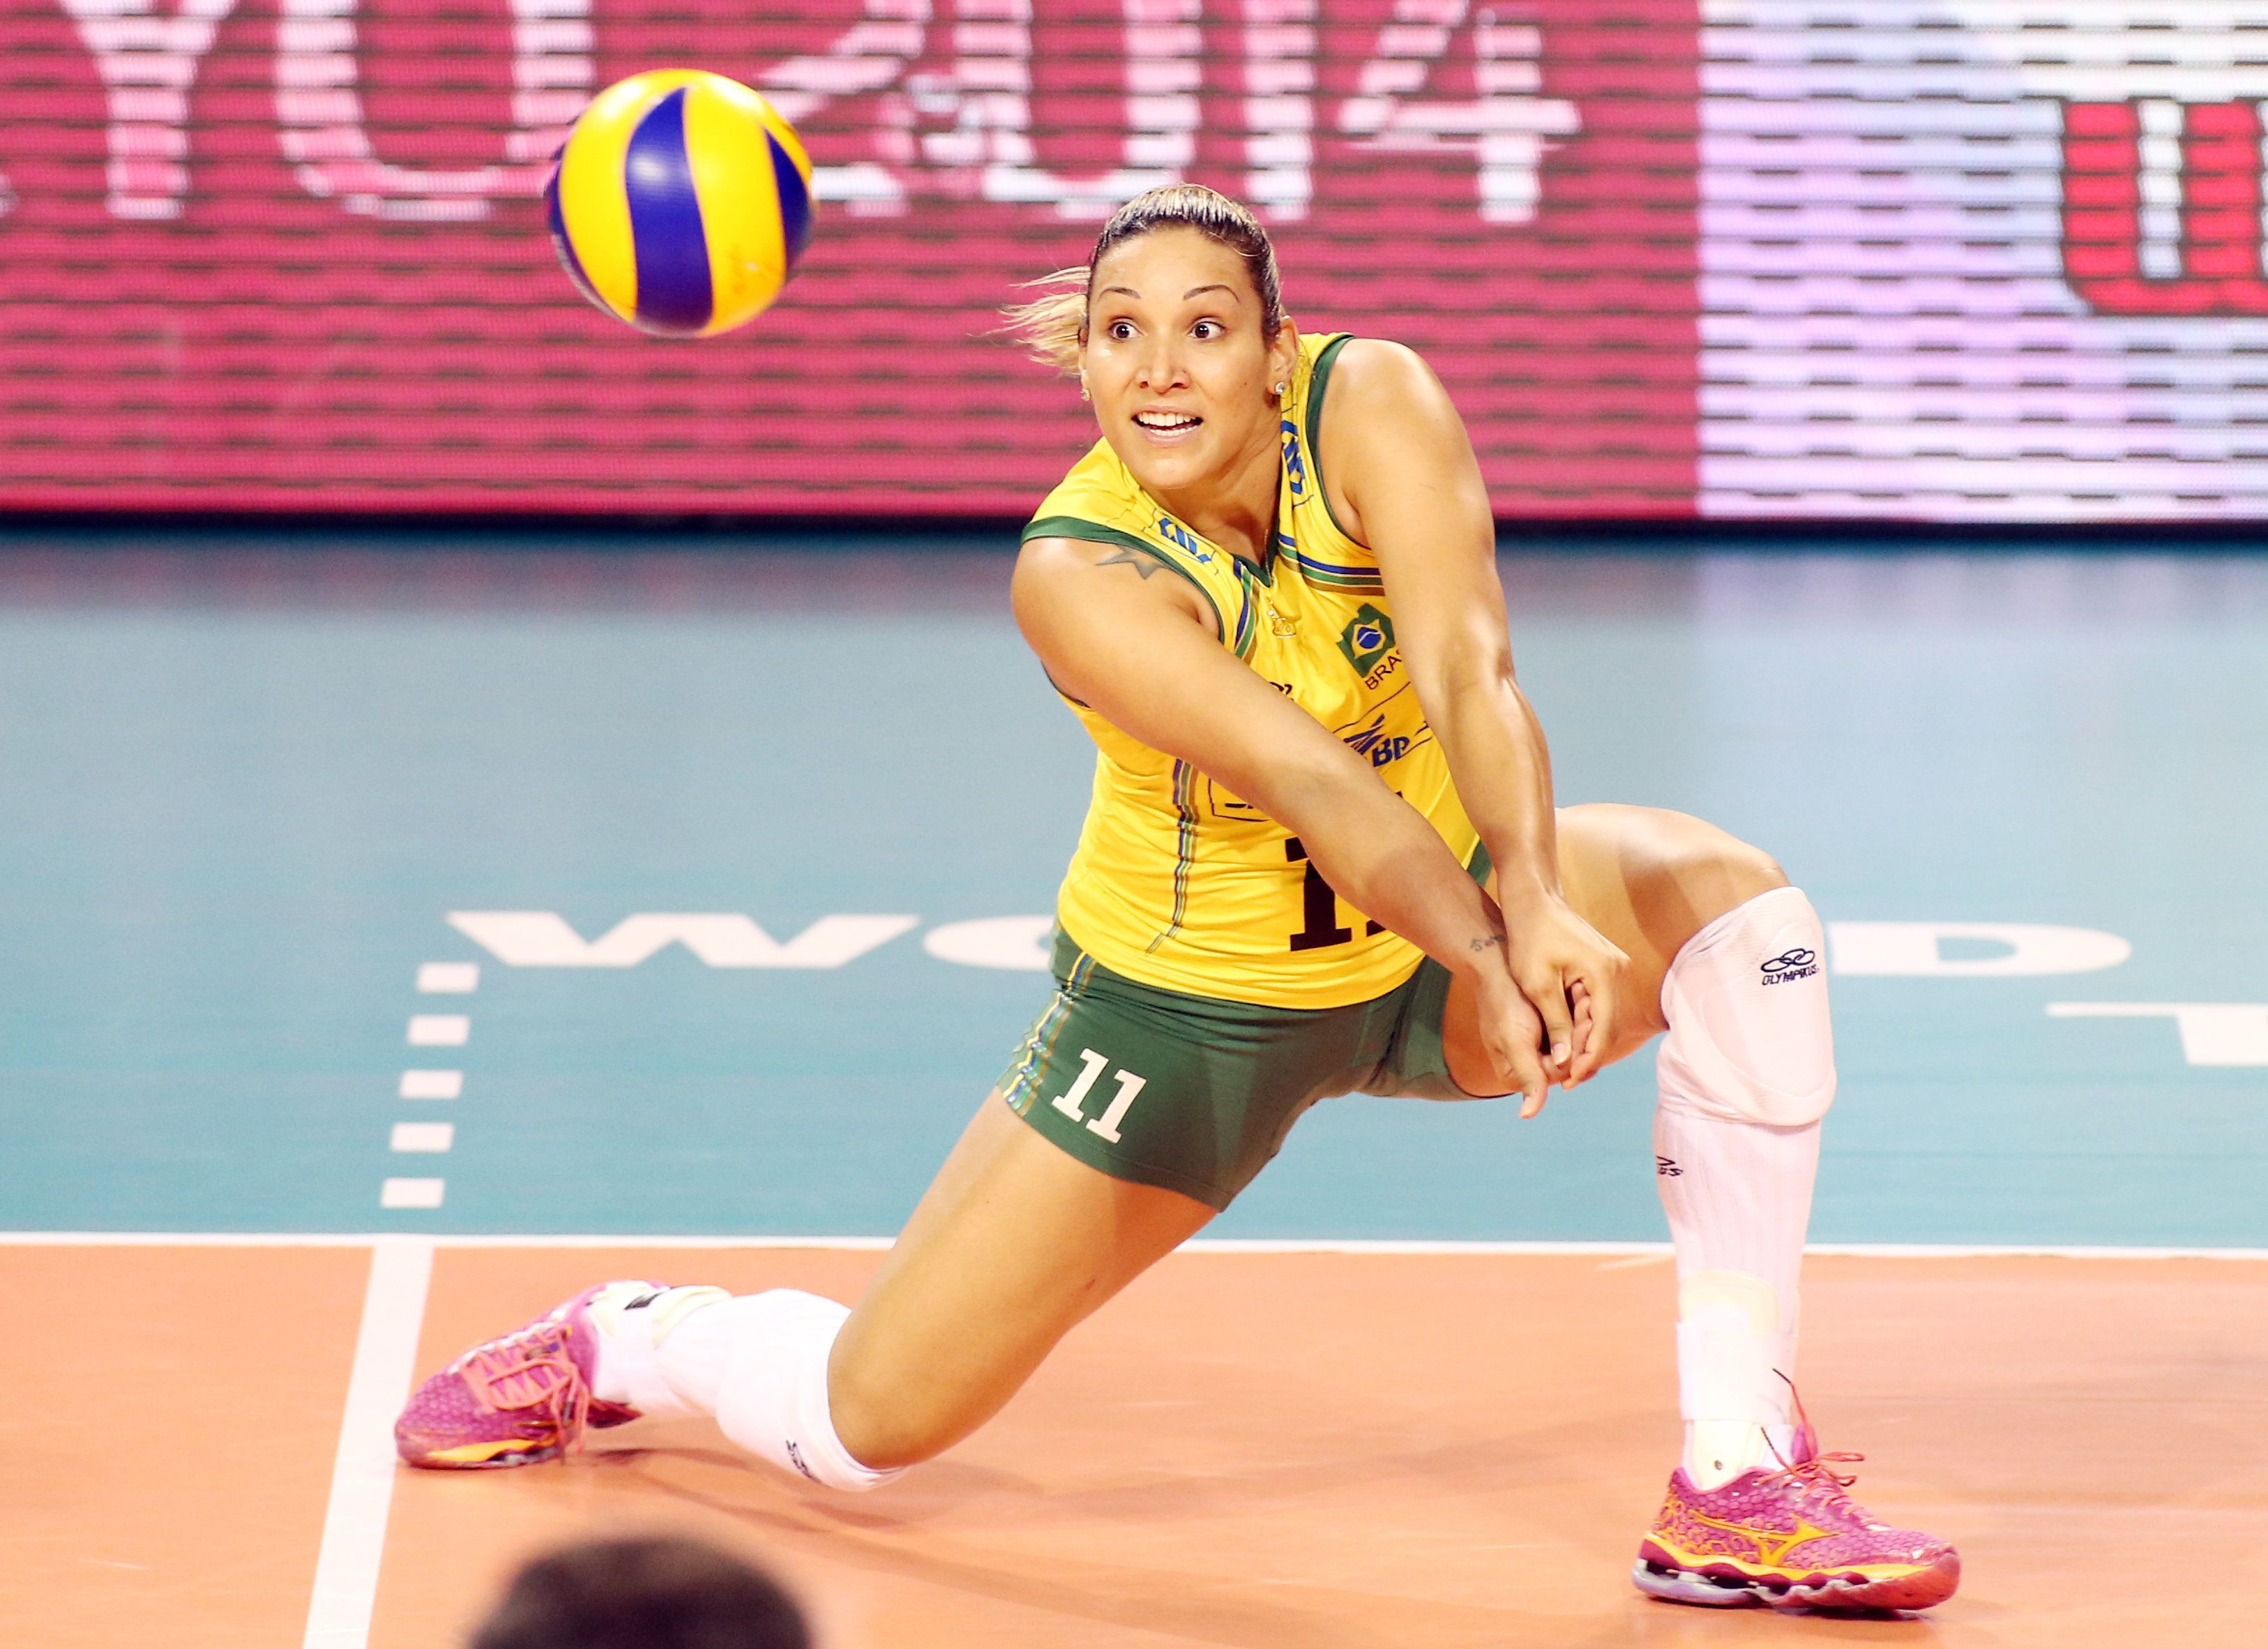 Brazil S Caixeta Tandara Receiving Female Volleyball Players Volleyball Players Volleyball Team